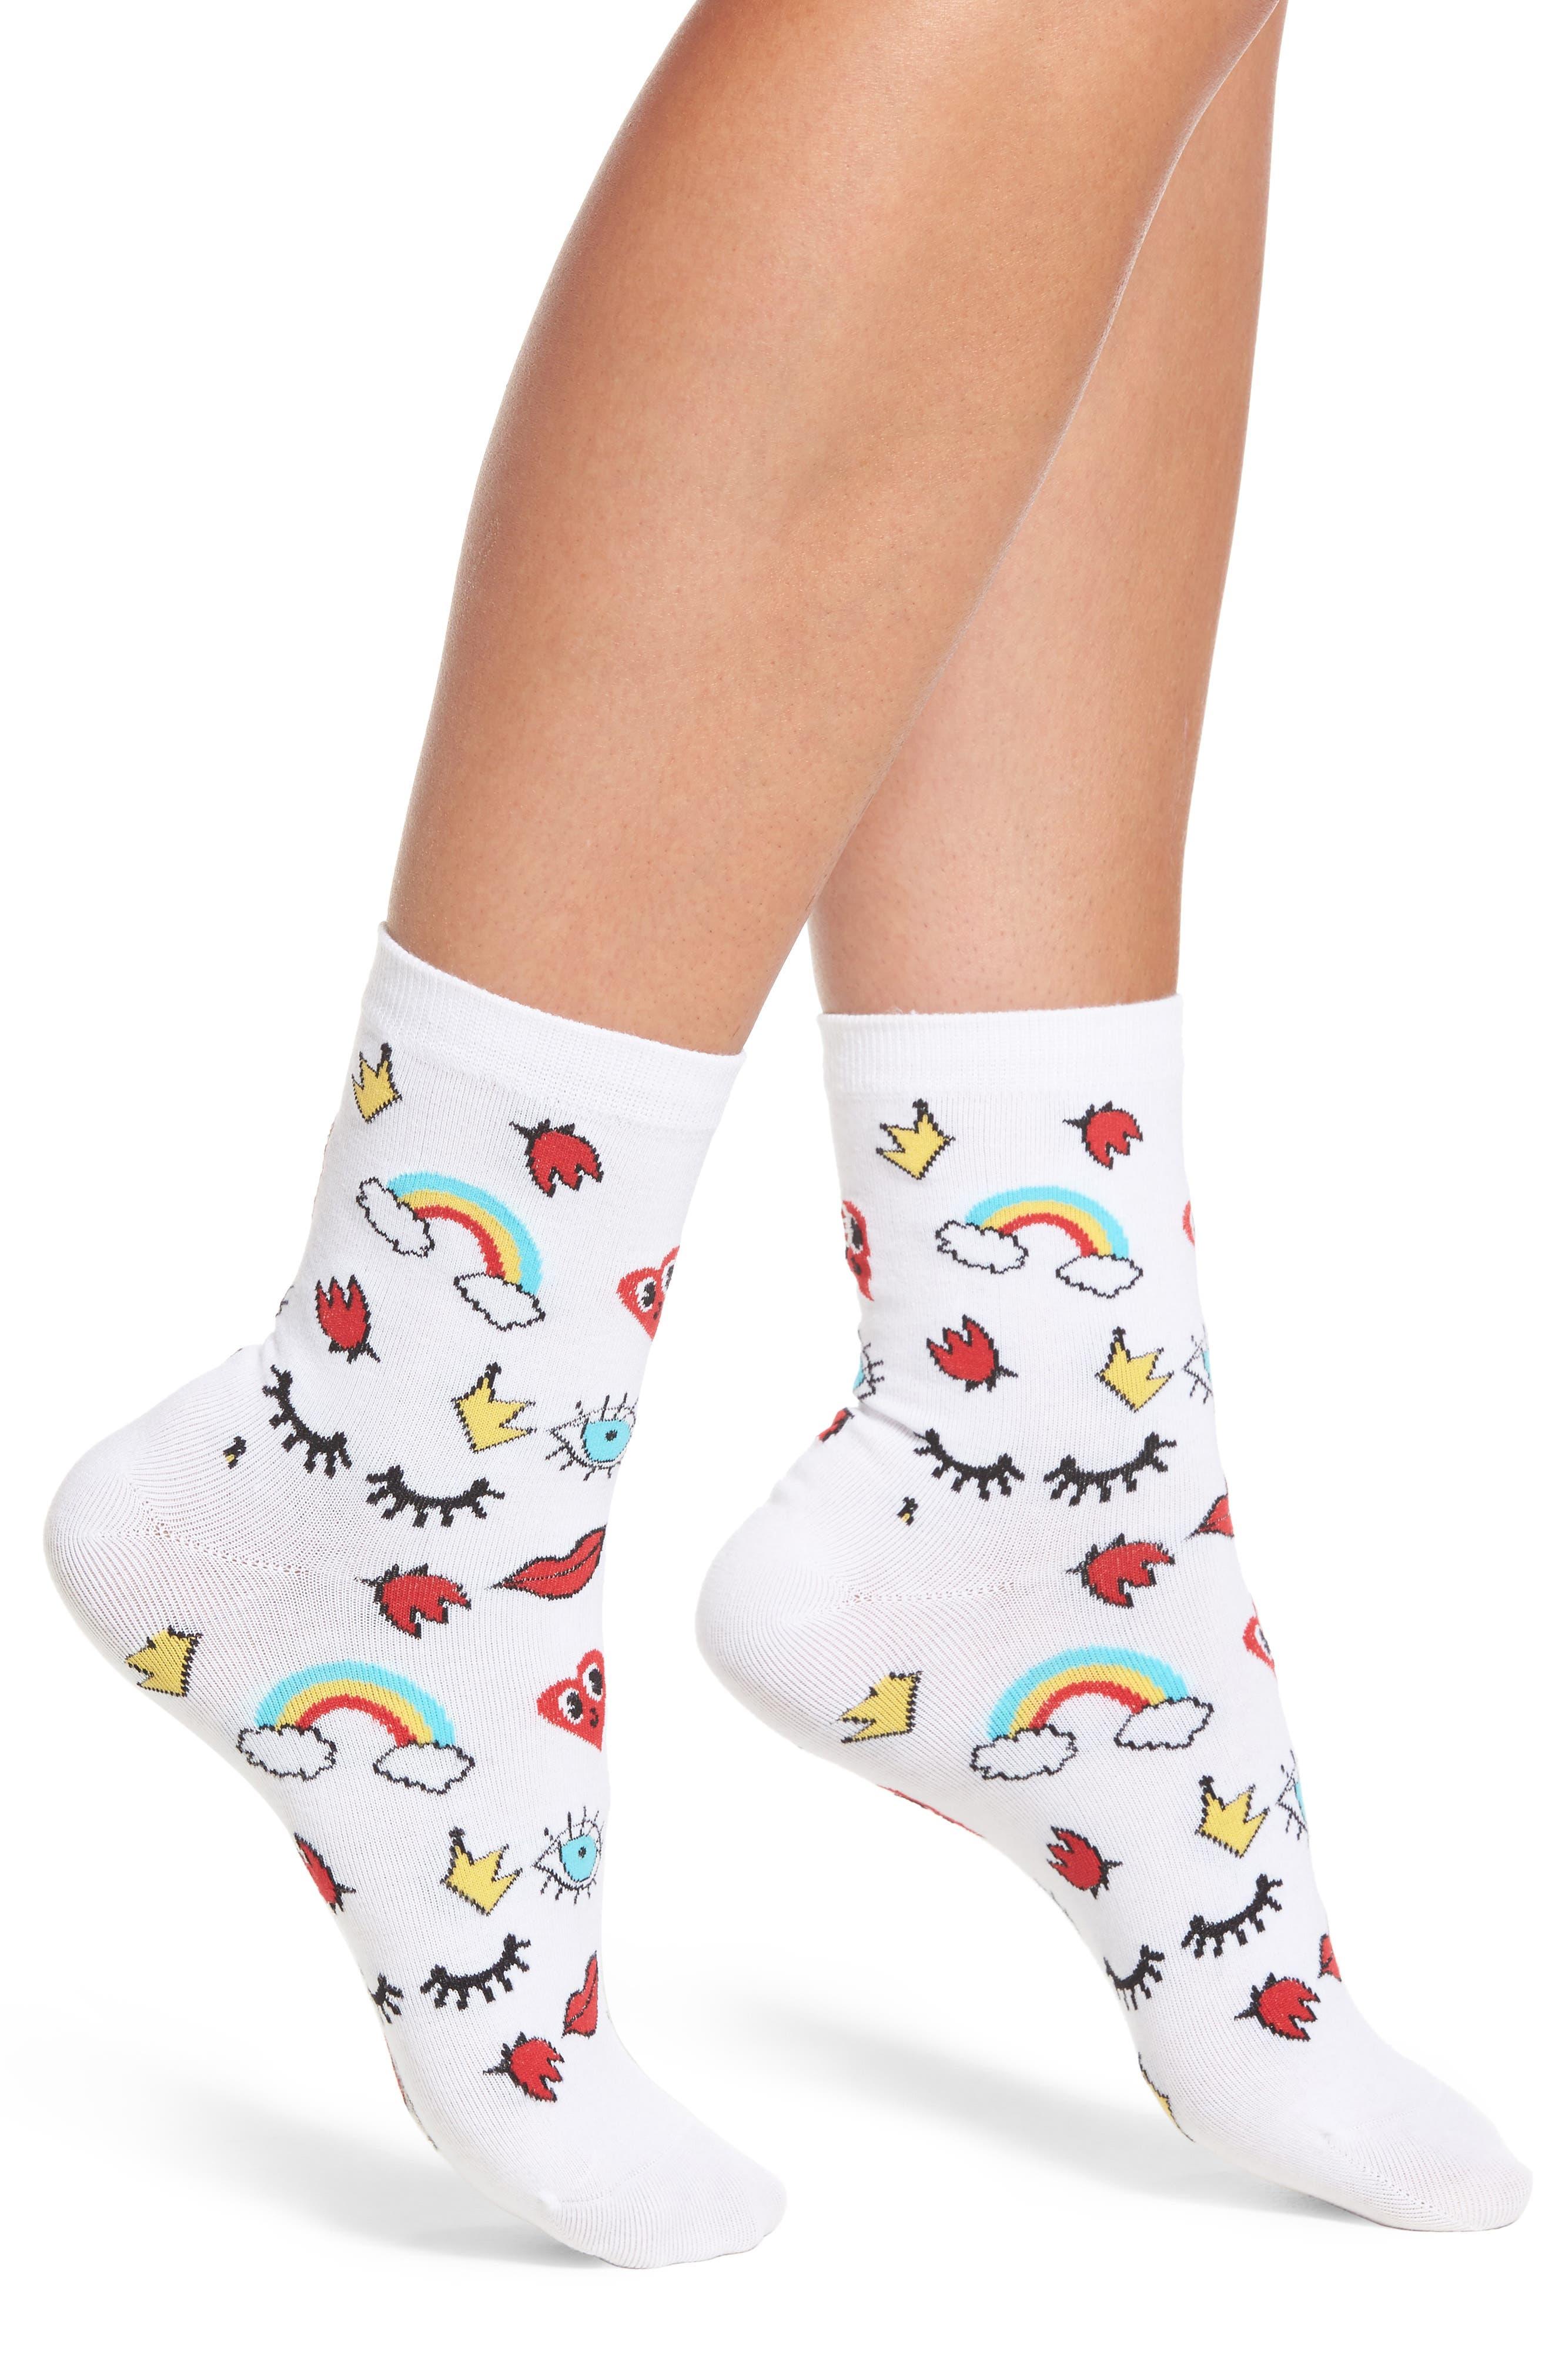 Main Image - SOCKART Eyes Lips Crowns Ankle Socks